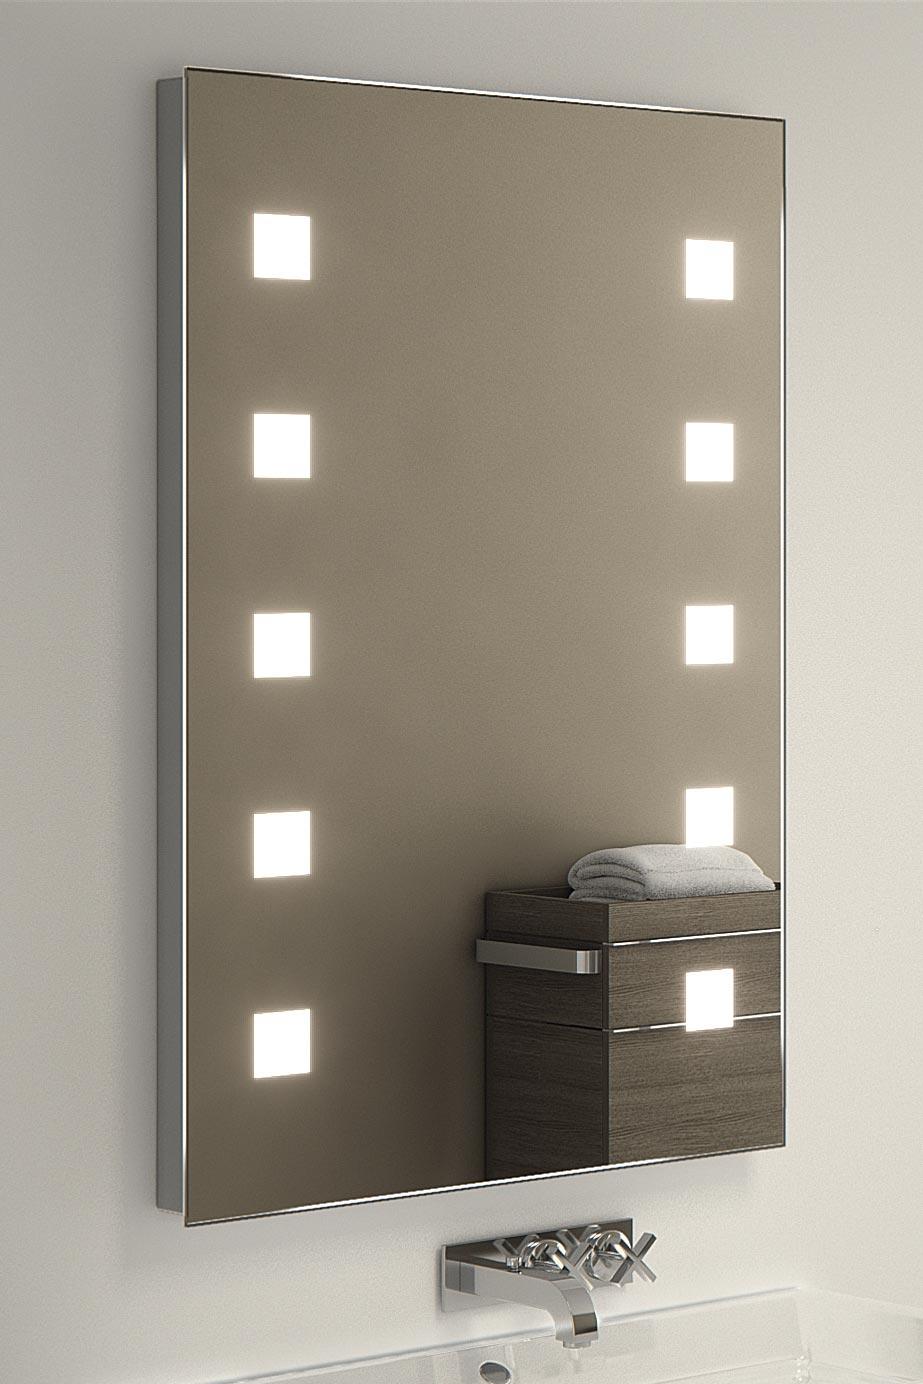 veena audio shaver led bathroom mirror with demister pad sensor